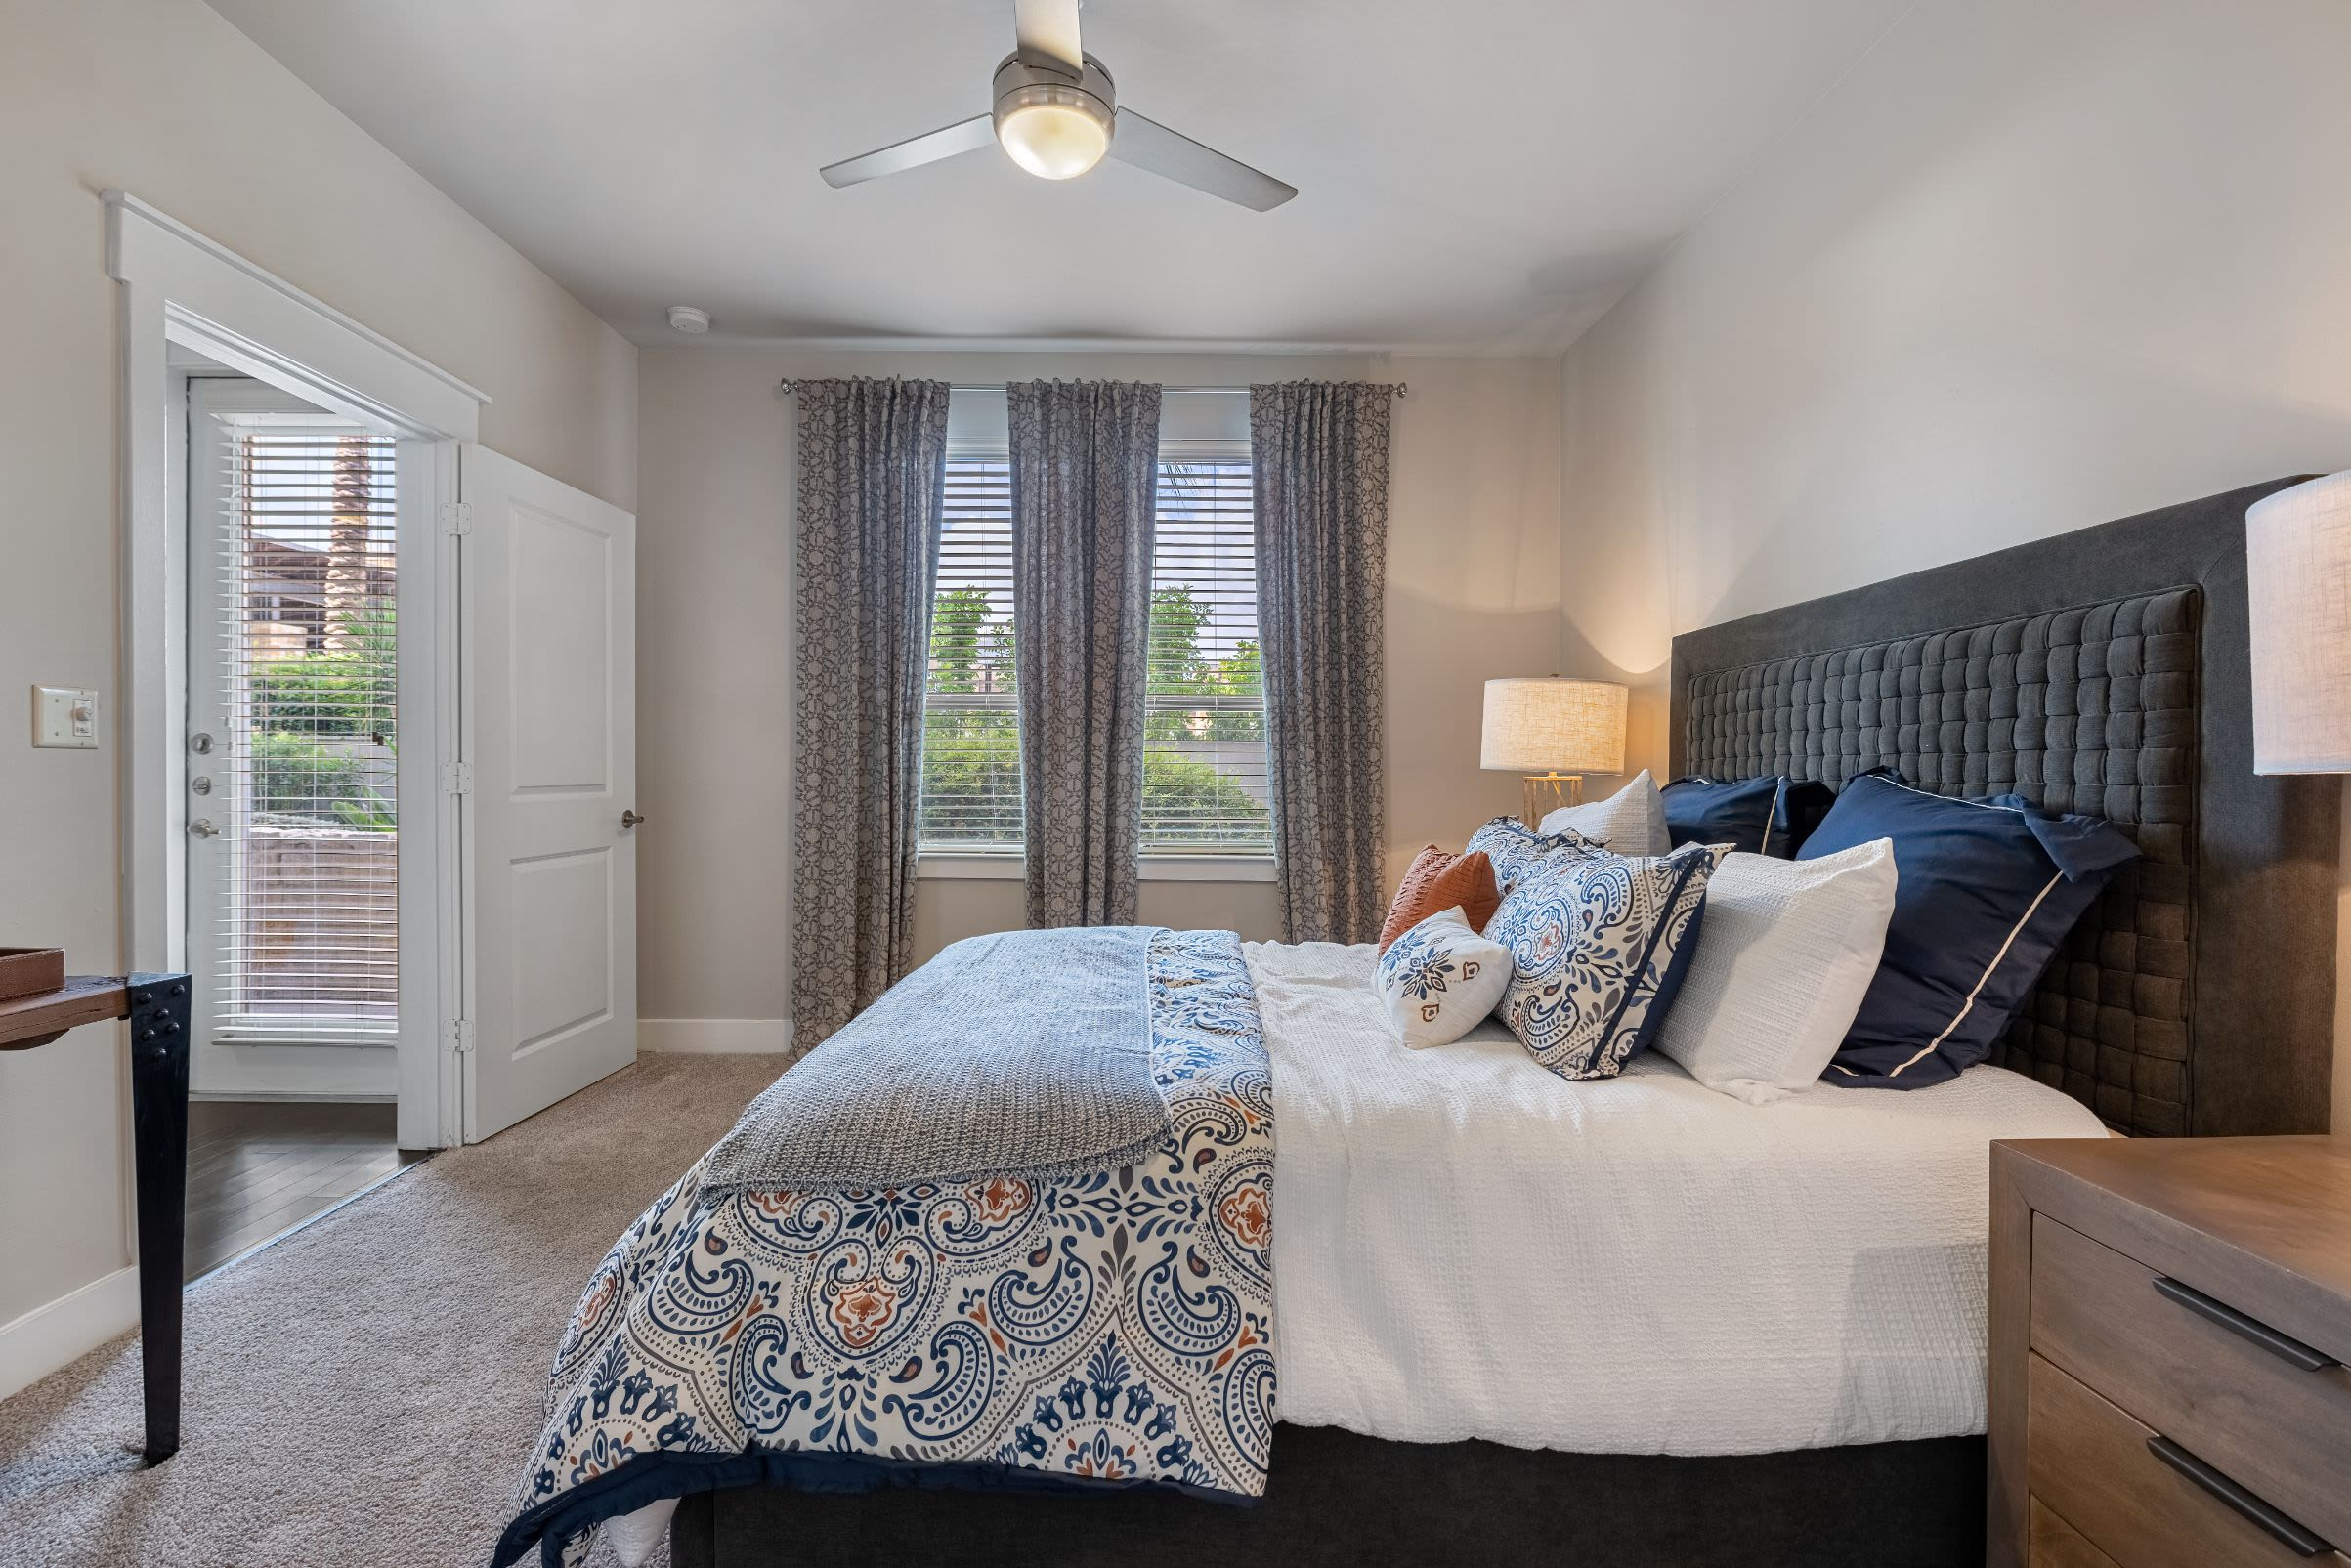 Bedroom with large window at Marquis Cresta Bella in San Antonio, Texas